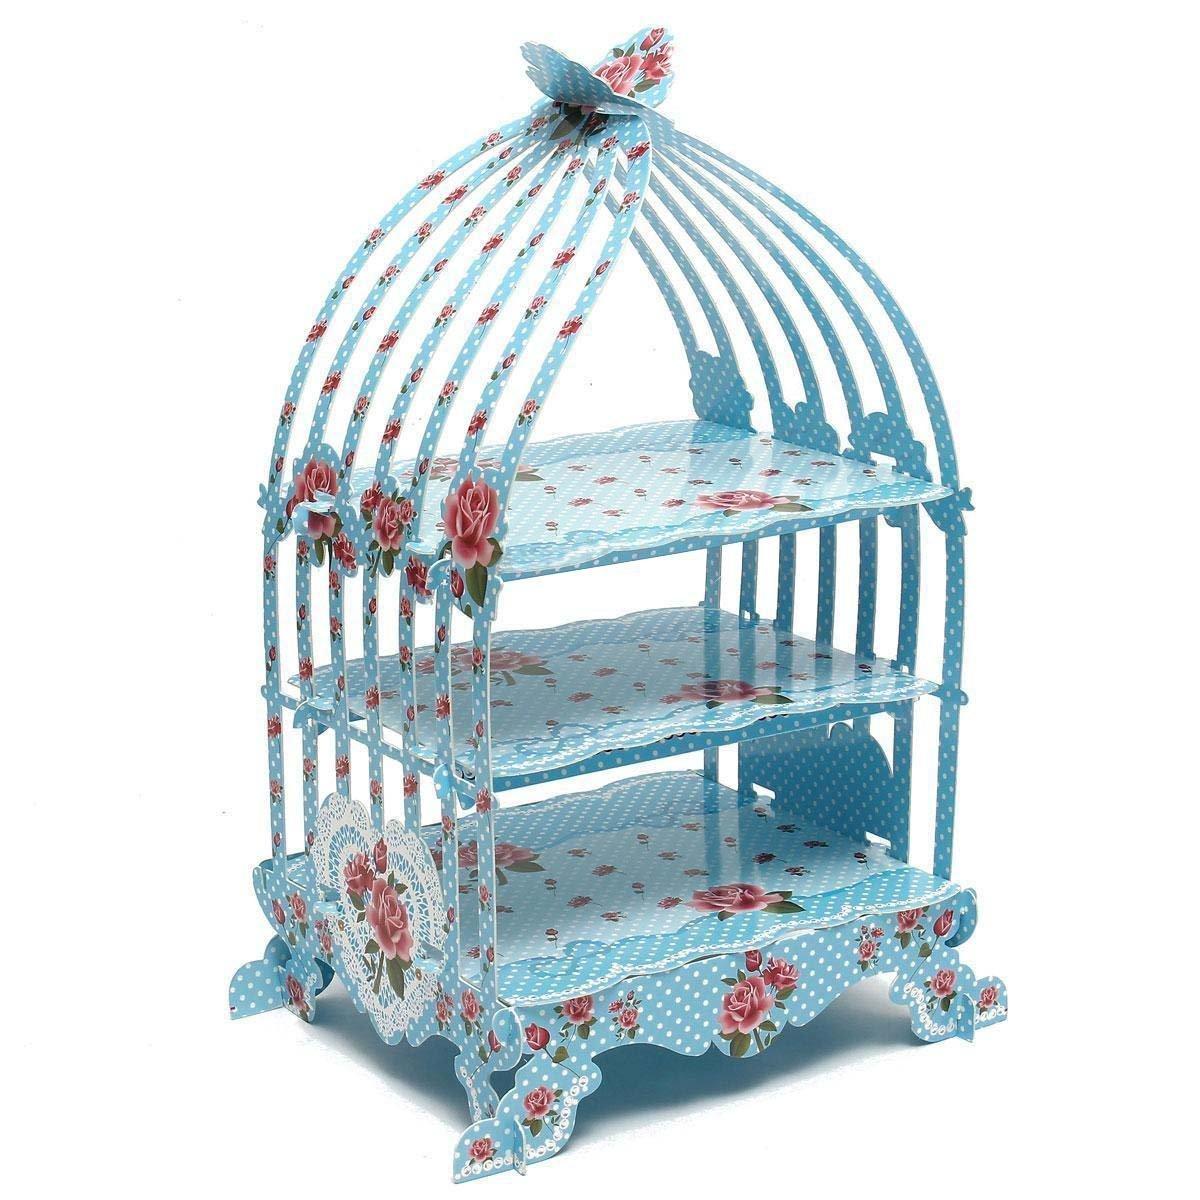 SODIAL(R) Birdcage Cupcake Cardboard Cake Stand Vintage Wedding Tea Party Display Holder blue LEPTS1111